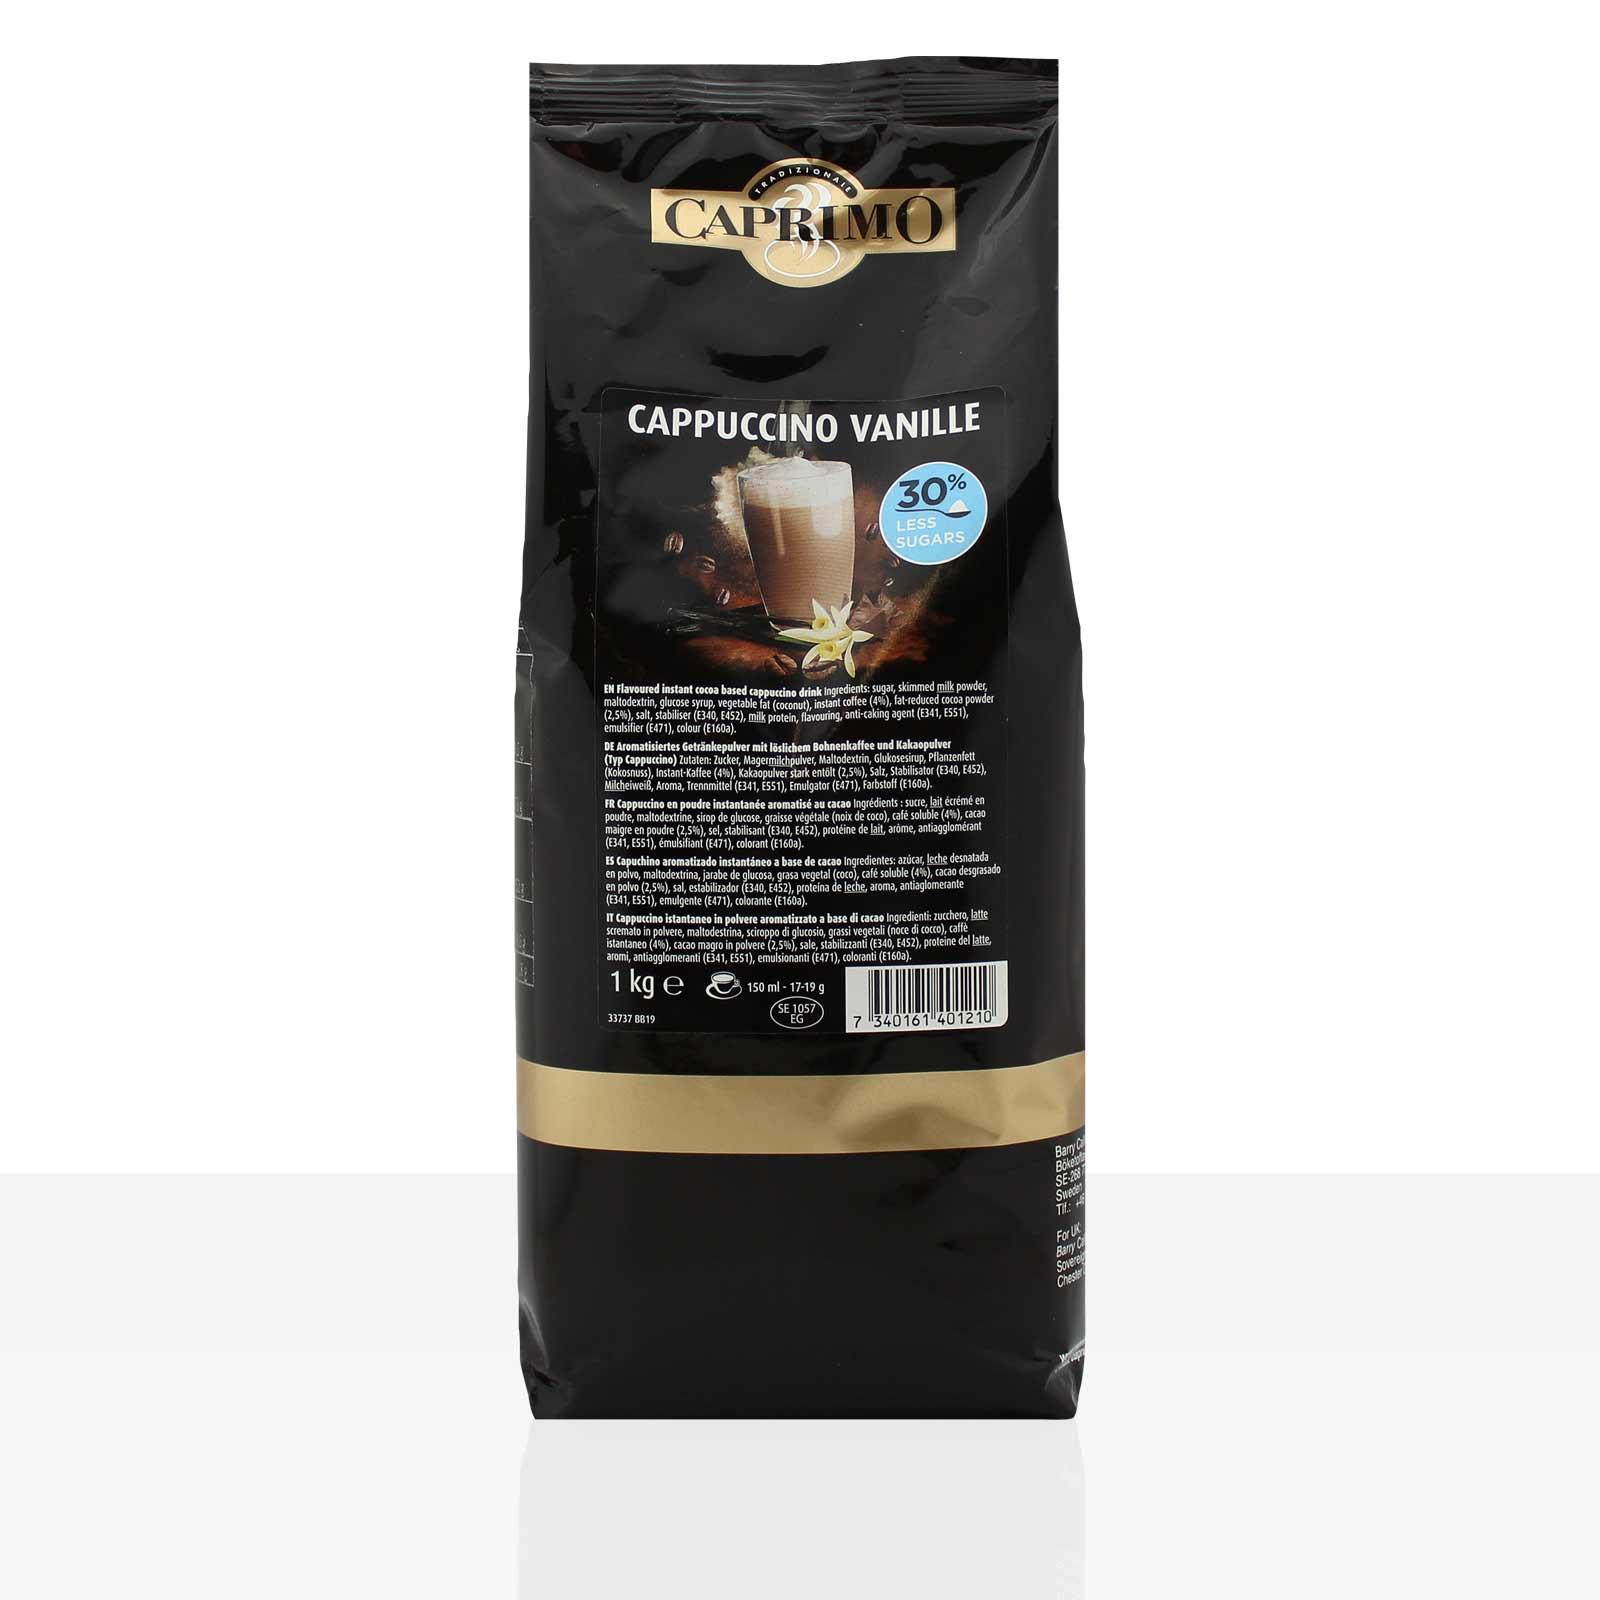 Caprimo Cappuccino Cafe Vanille 1Kg